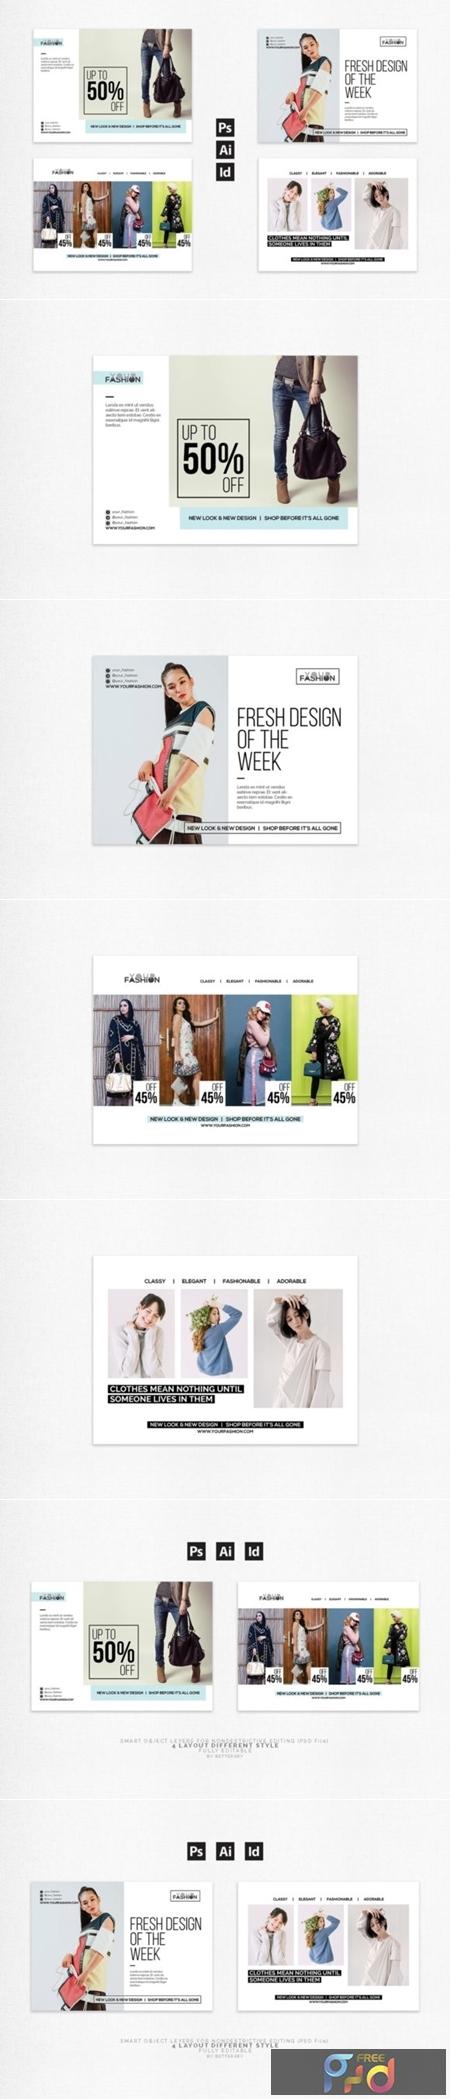 Fashion Postcard Flyer 1673877 1